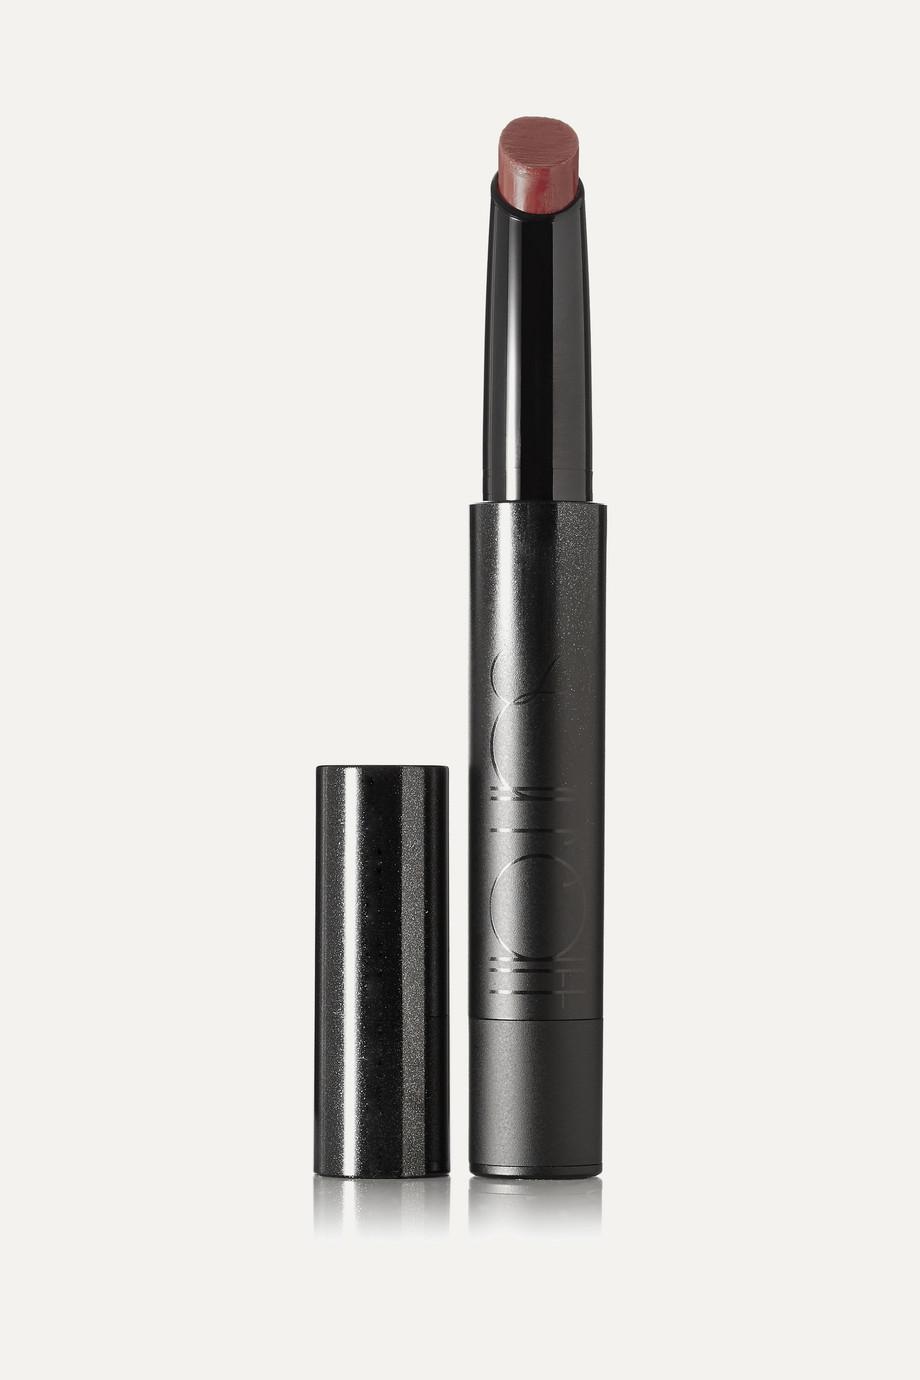 Surratt Beauty Lipslique – Hevyn 14 – Lippenstift